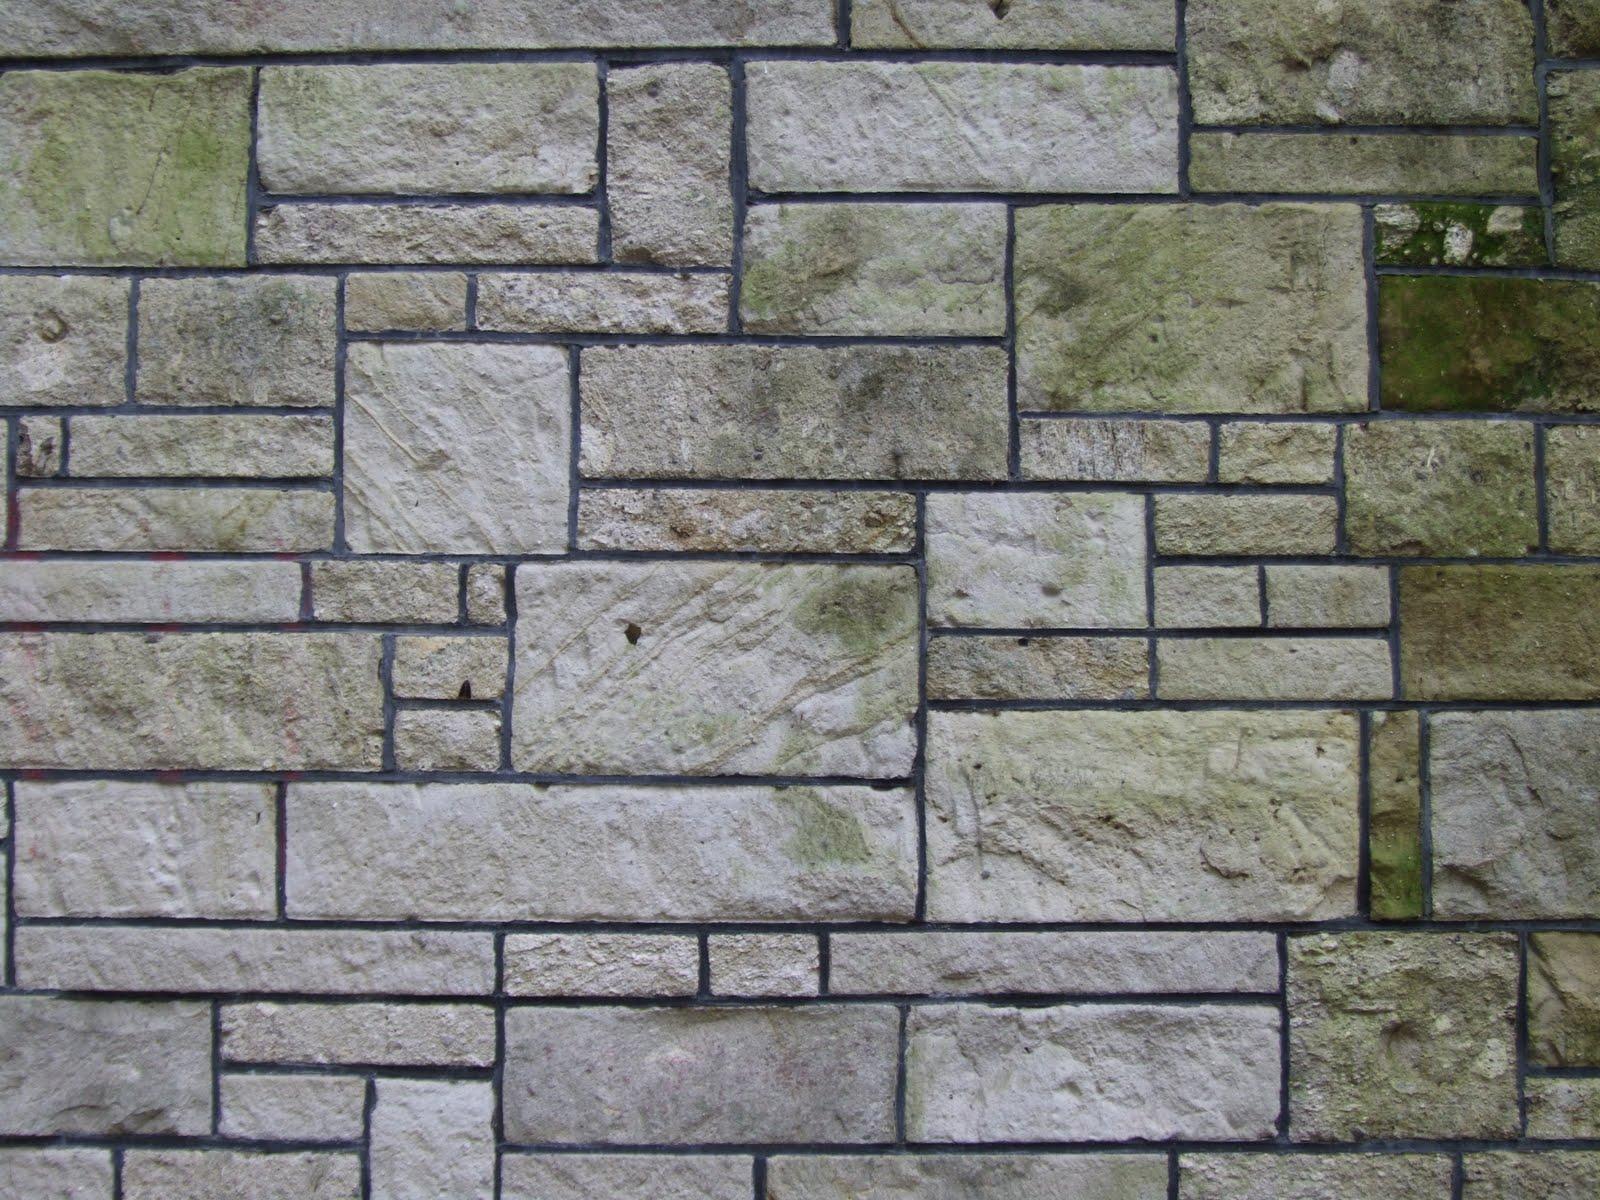 Apuntes revista digital de arquitectura arquitexturas - Tipos de muros de piedra ...